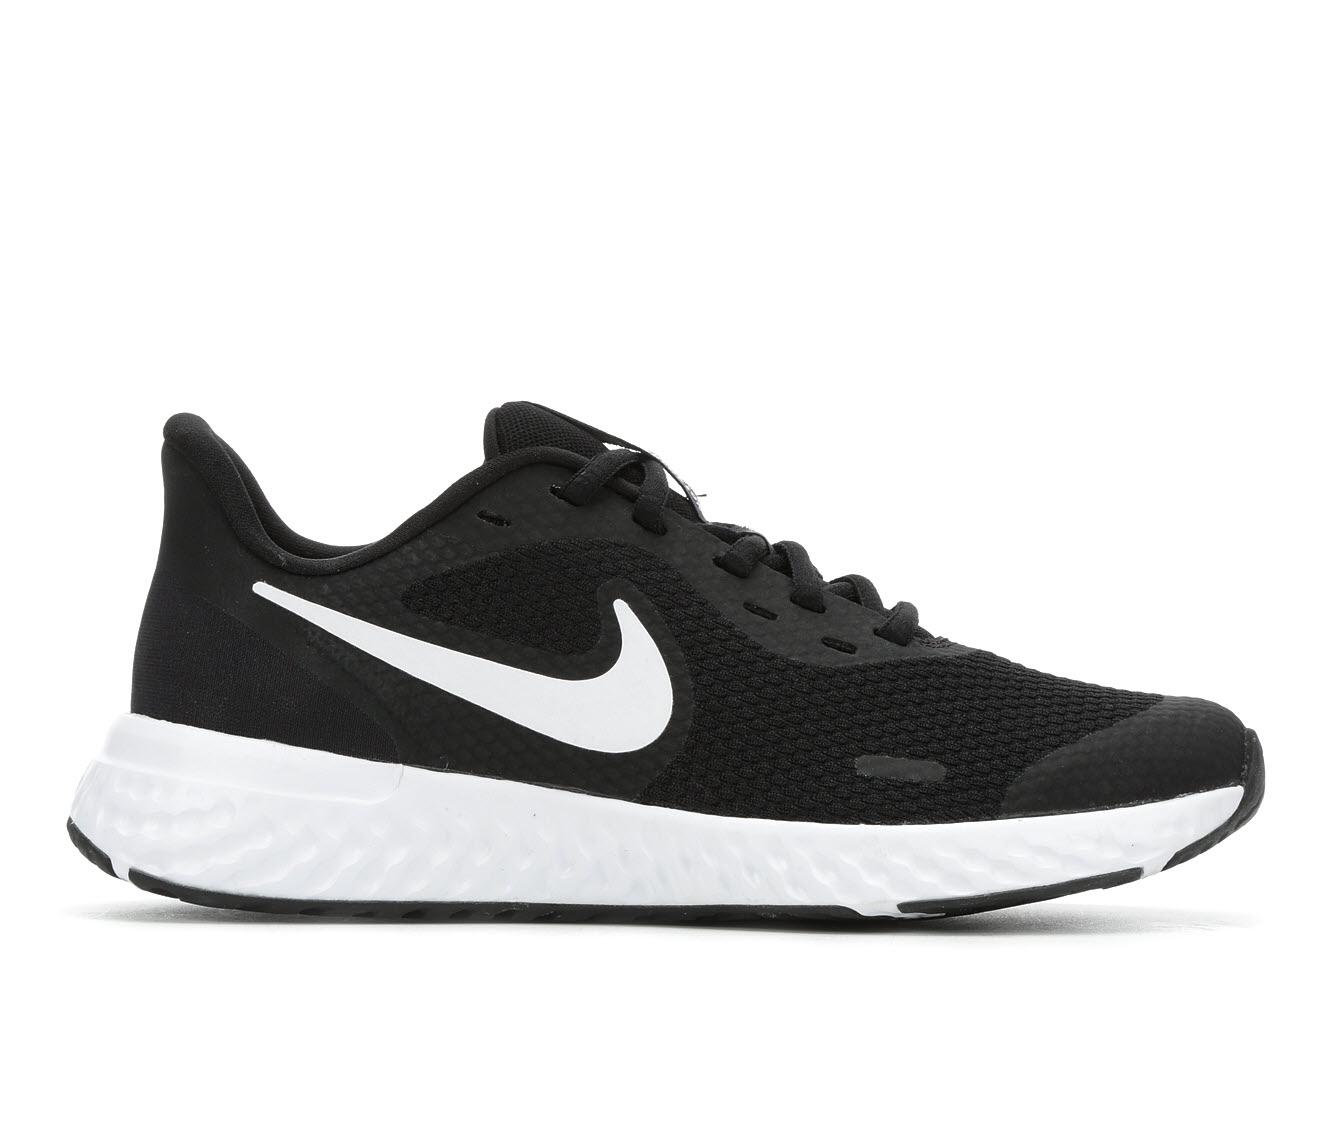 Boys' Nike Revolution 5 Wide GS 3.5-7